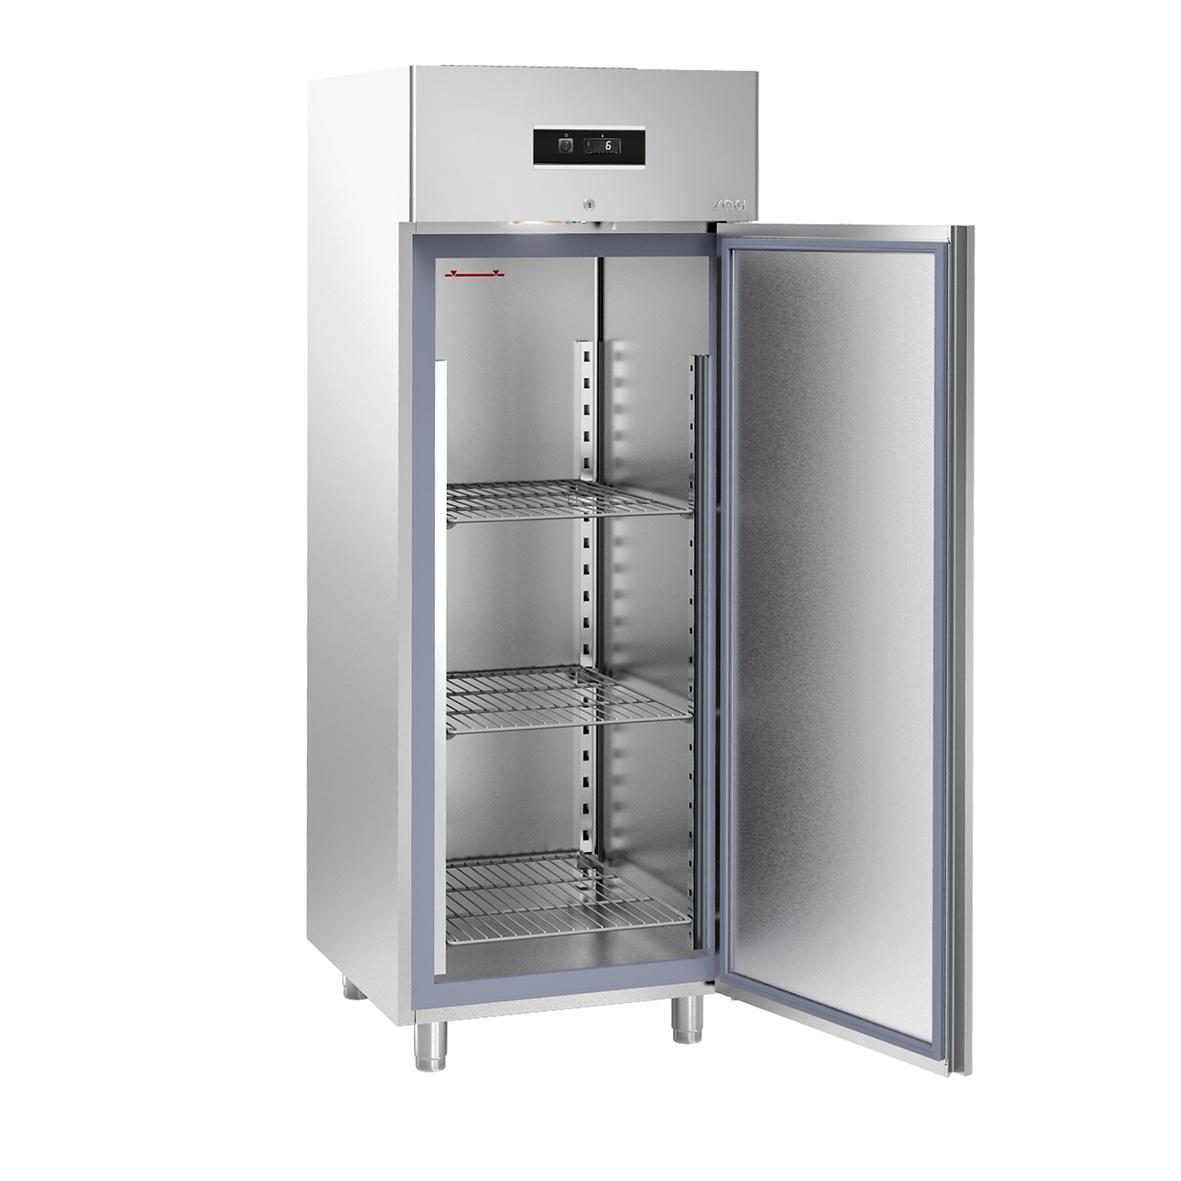 Sagi-Freezy-Supplier-In-Dubai